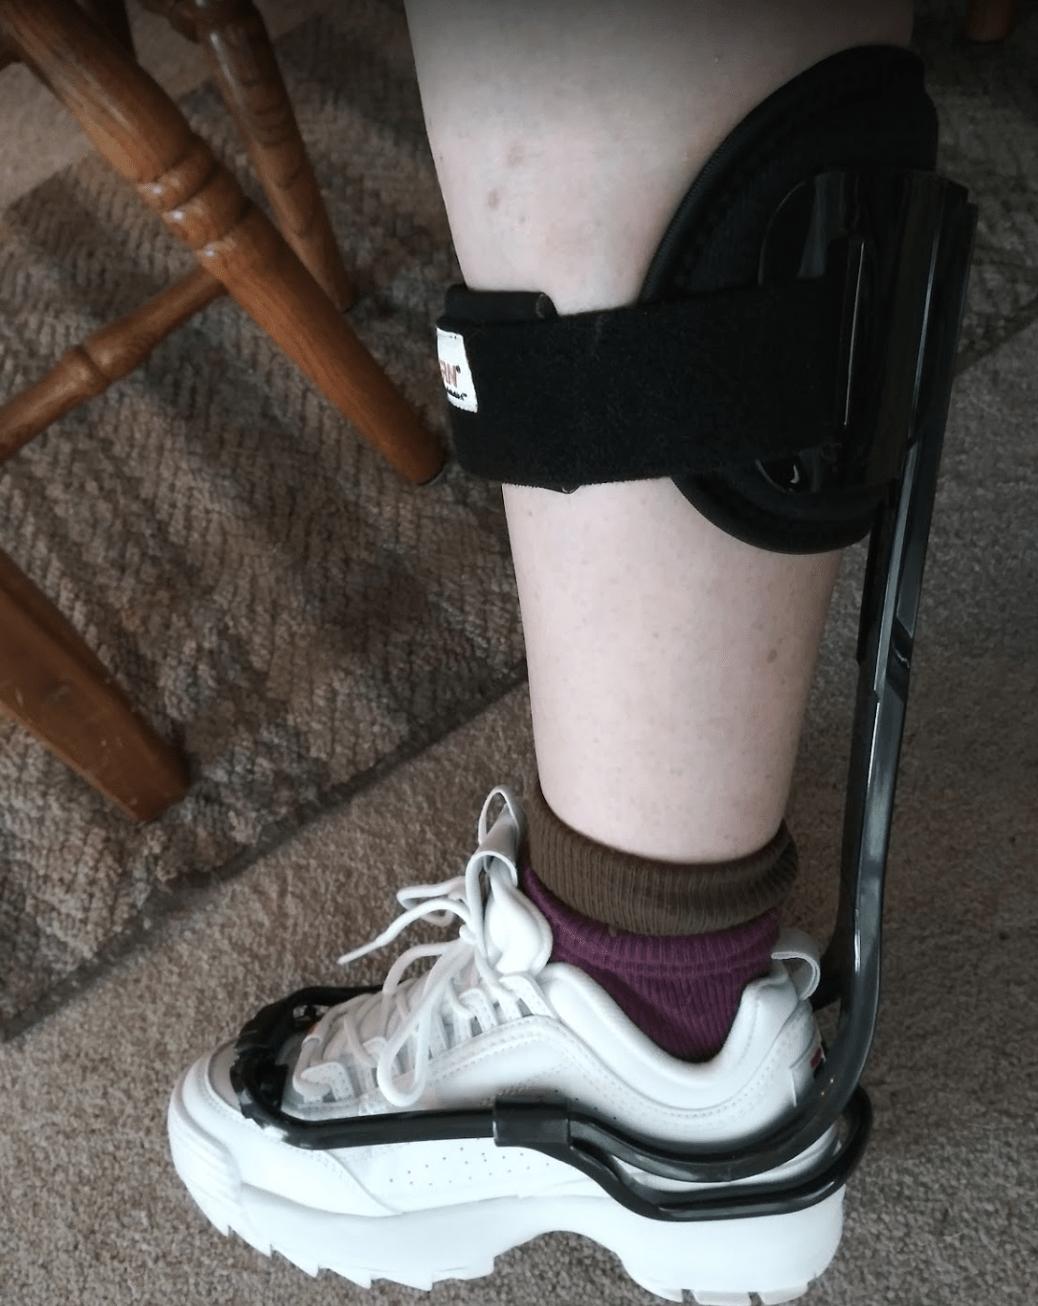 Woman's leg wearing a TurboMed AFO